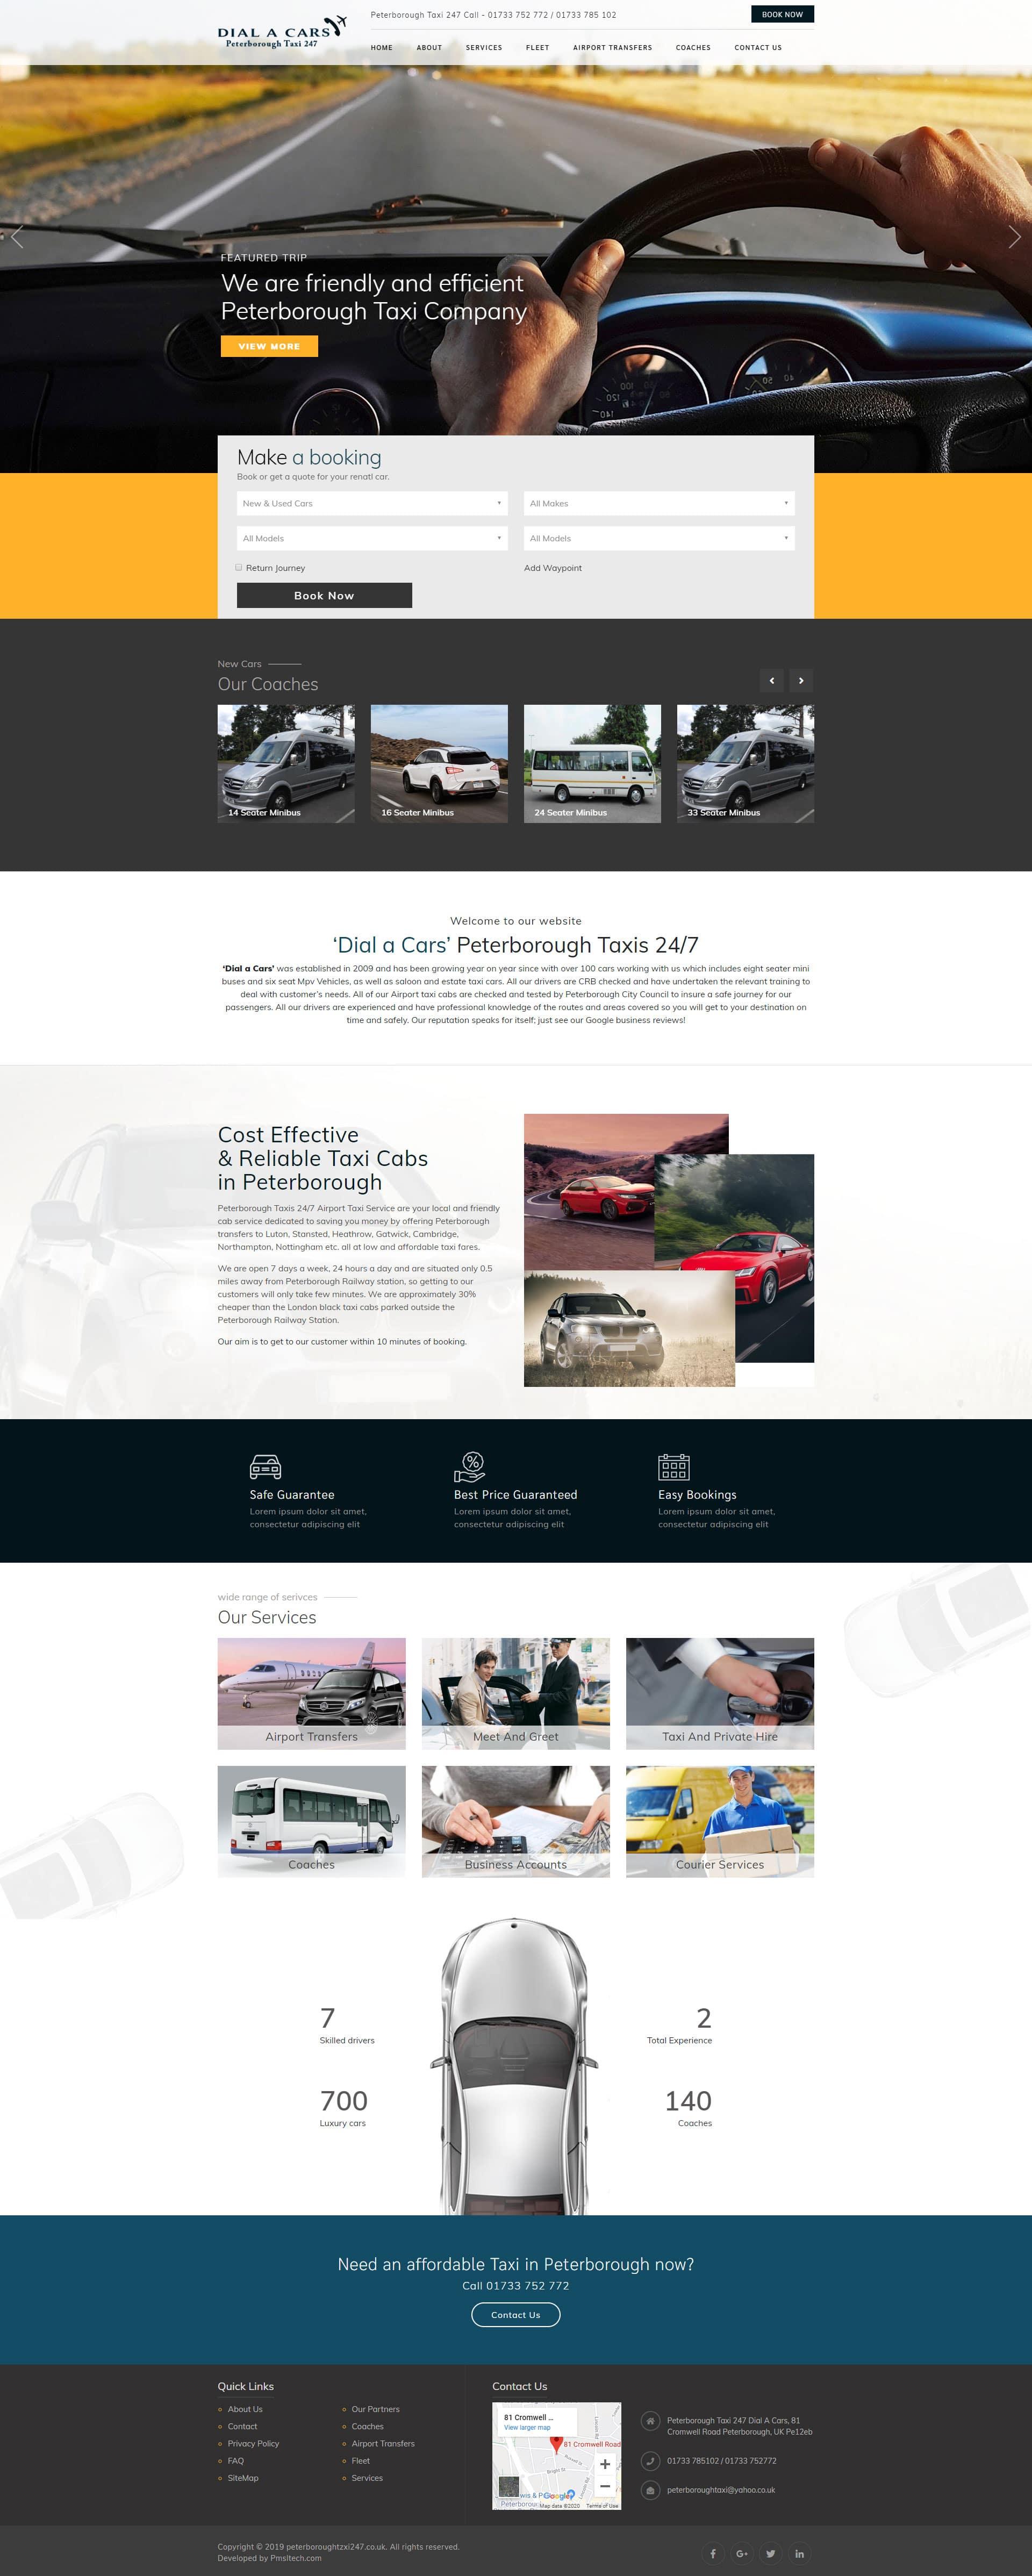 Car Booking Website Design